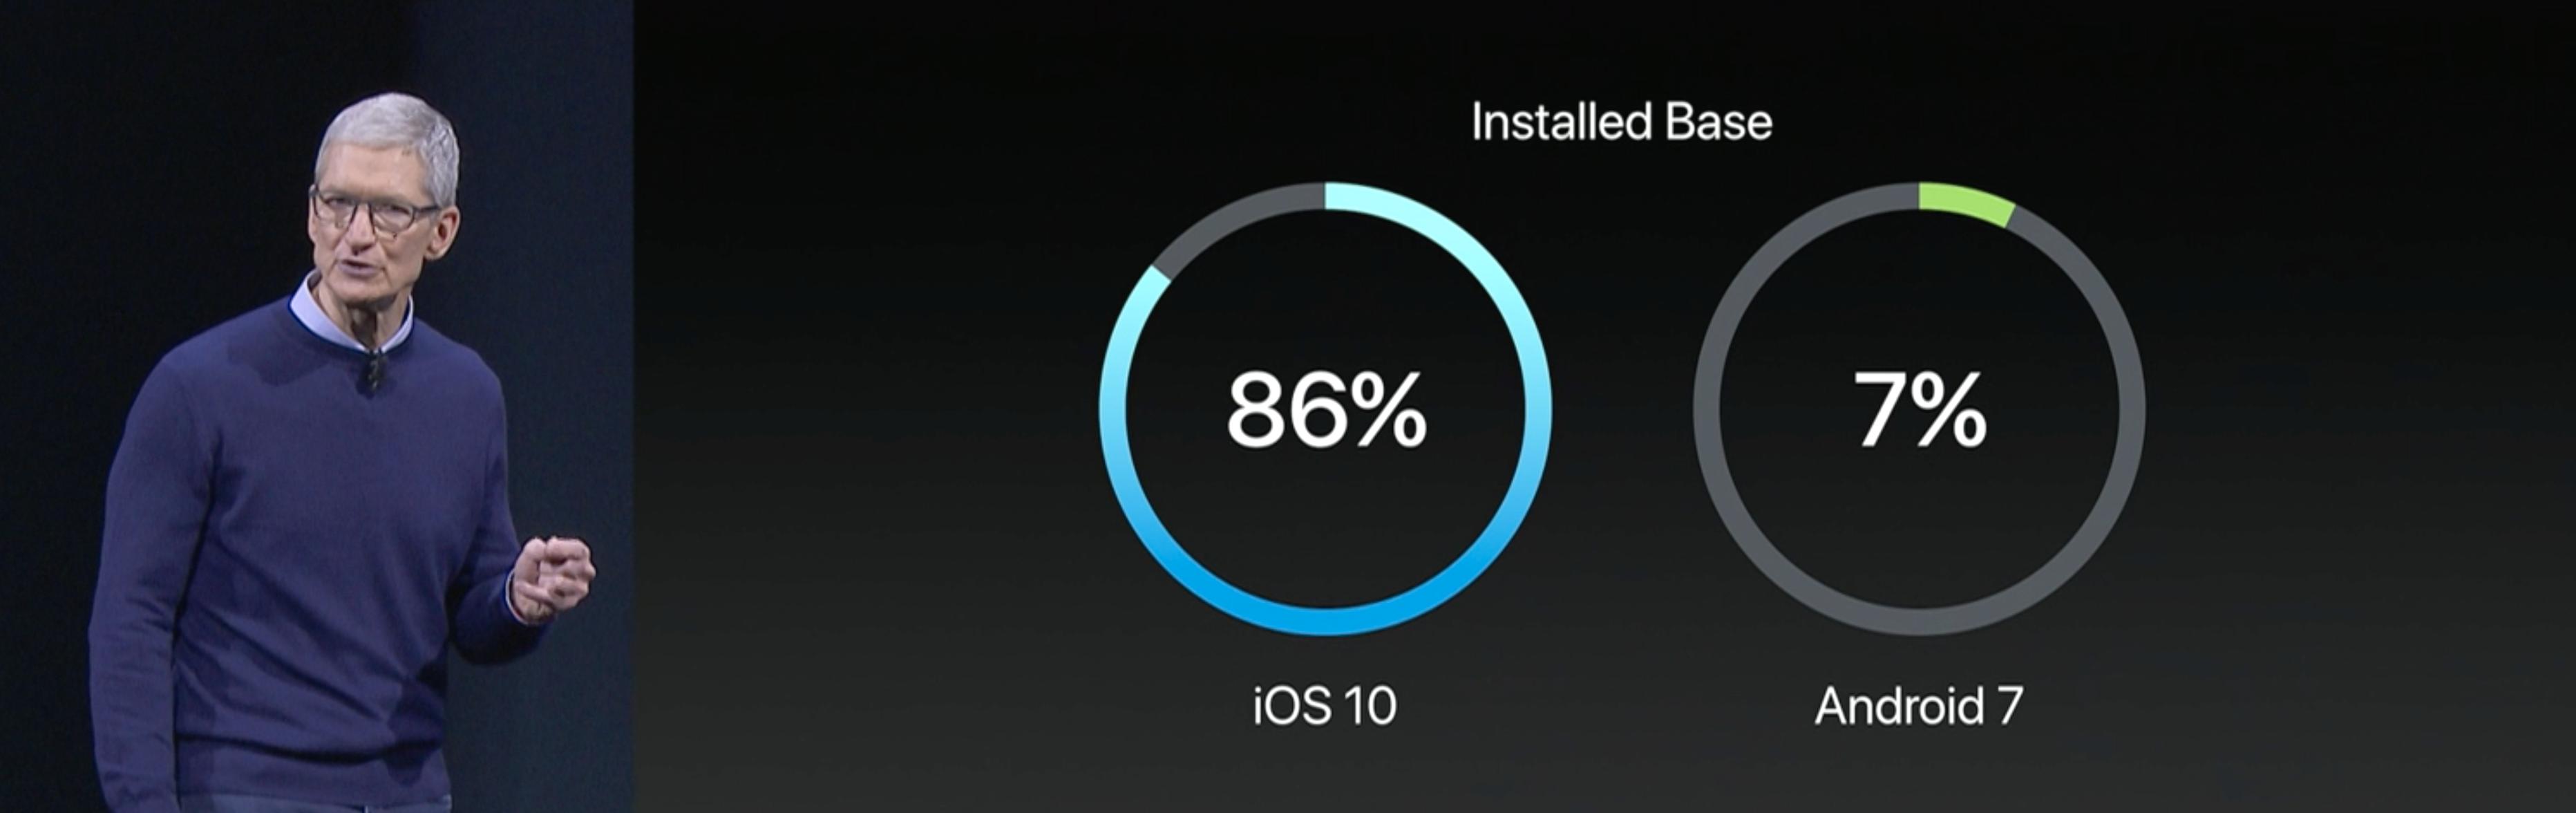 iOS er bedre opopdatert enn Android. BIIIIIG SURPRISE.